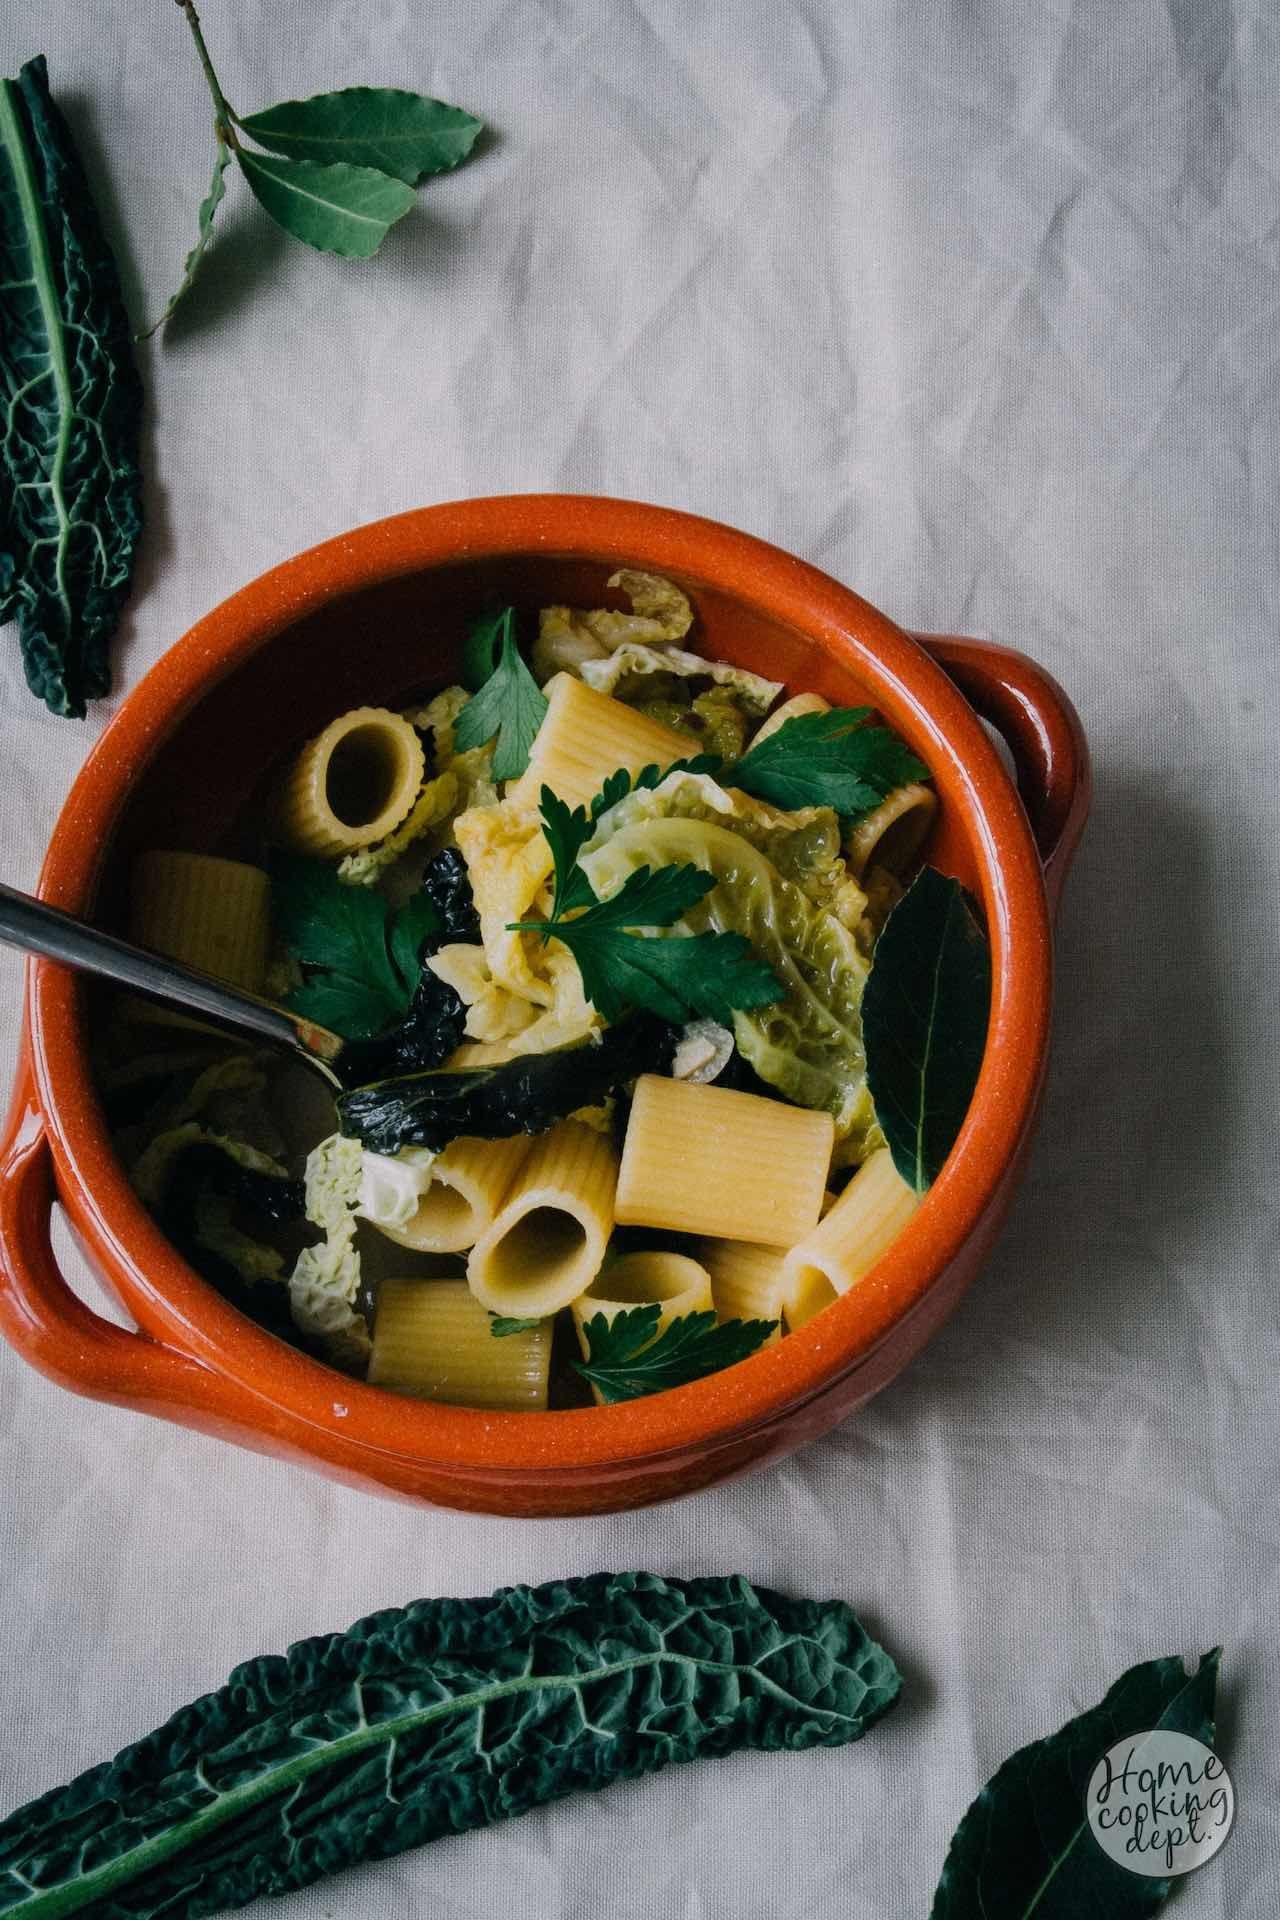 kale recipe / Parmezaanse kaas bouillon en boerenkool, pasta soep / Fotografie: Homecooking dept.